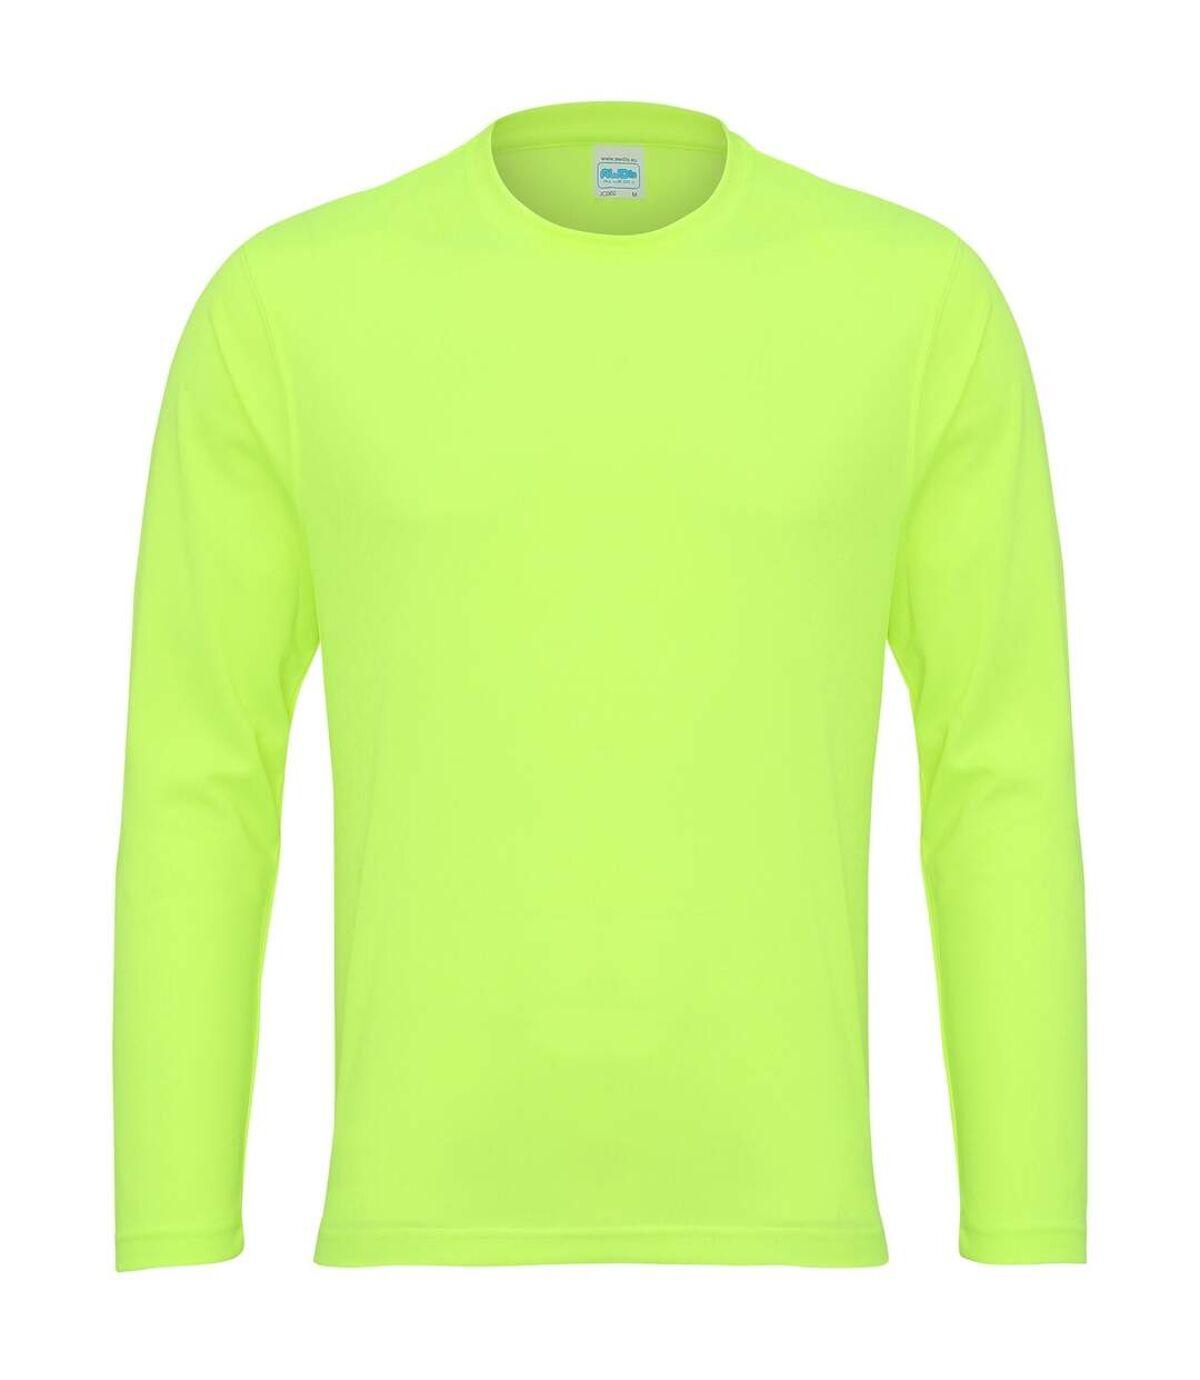 AWDis Just Cool Mens Long Sleeve Cool Sports Performance Plain T-Shirt (Electric Orange) - UTRW684